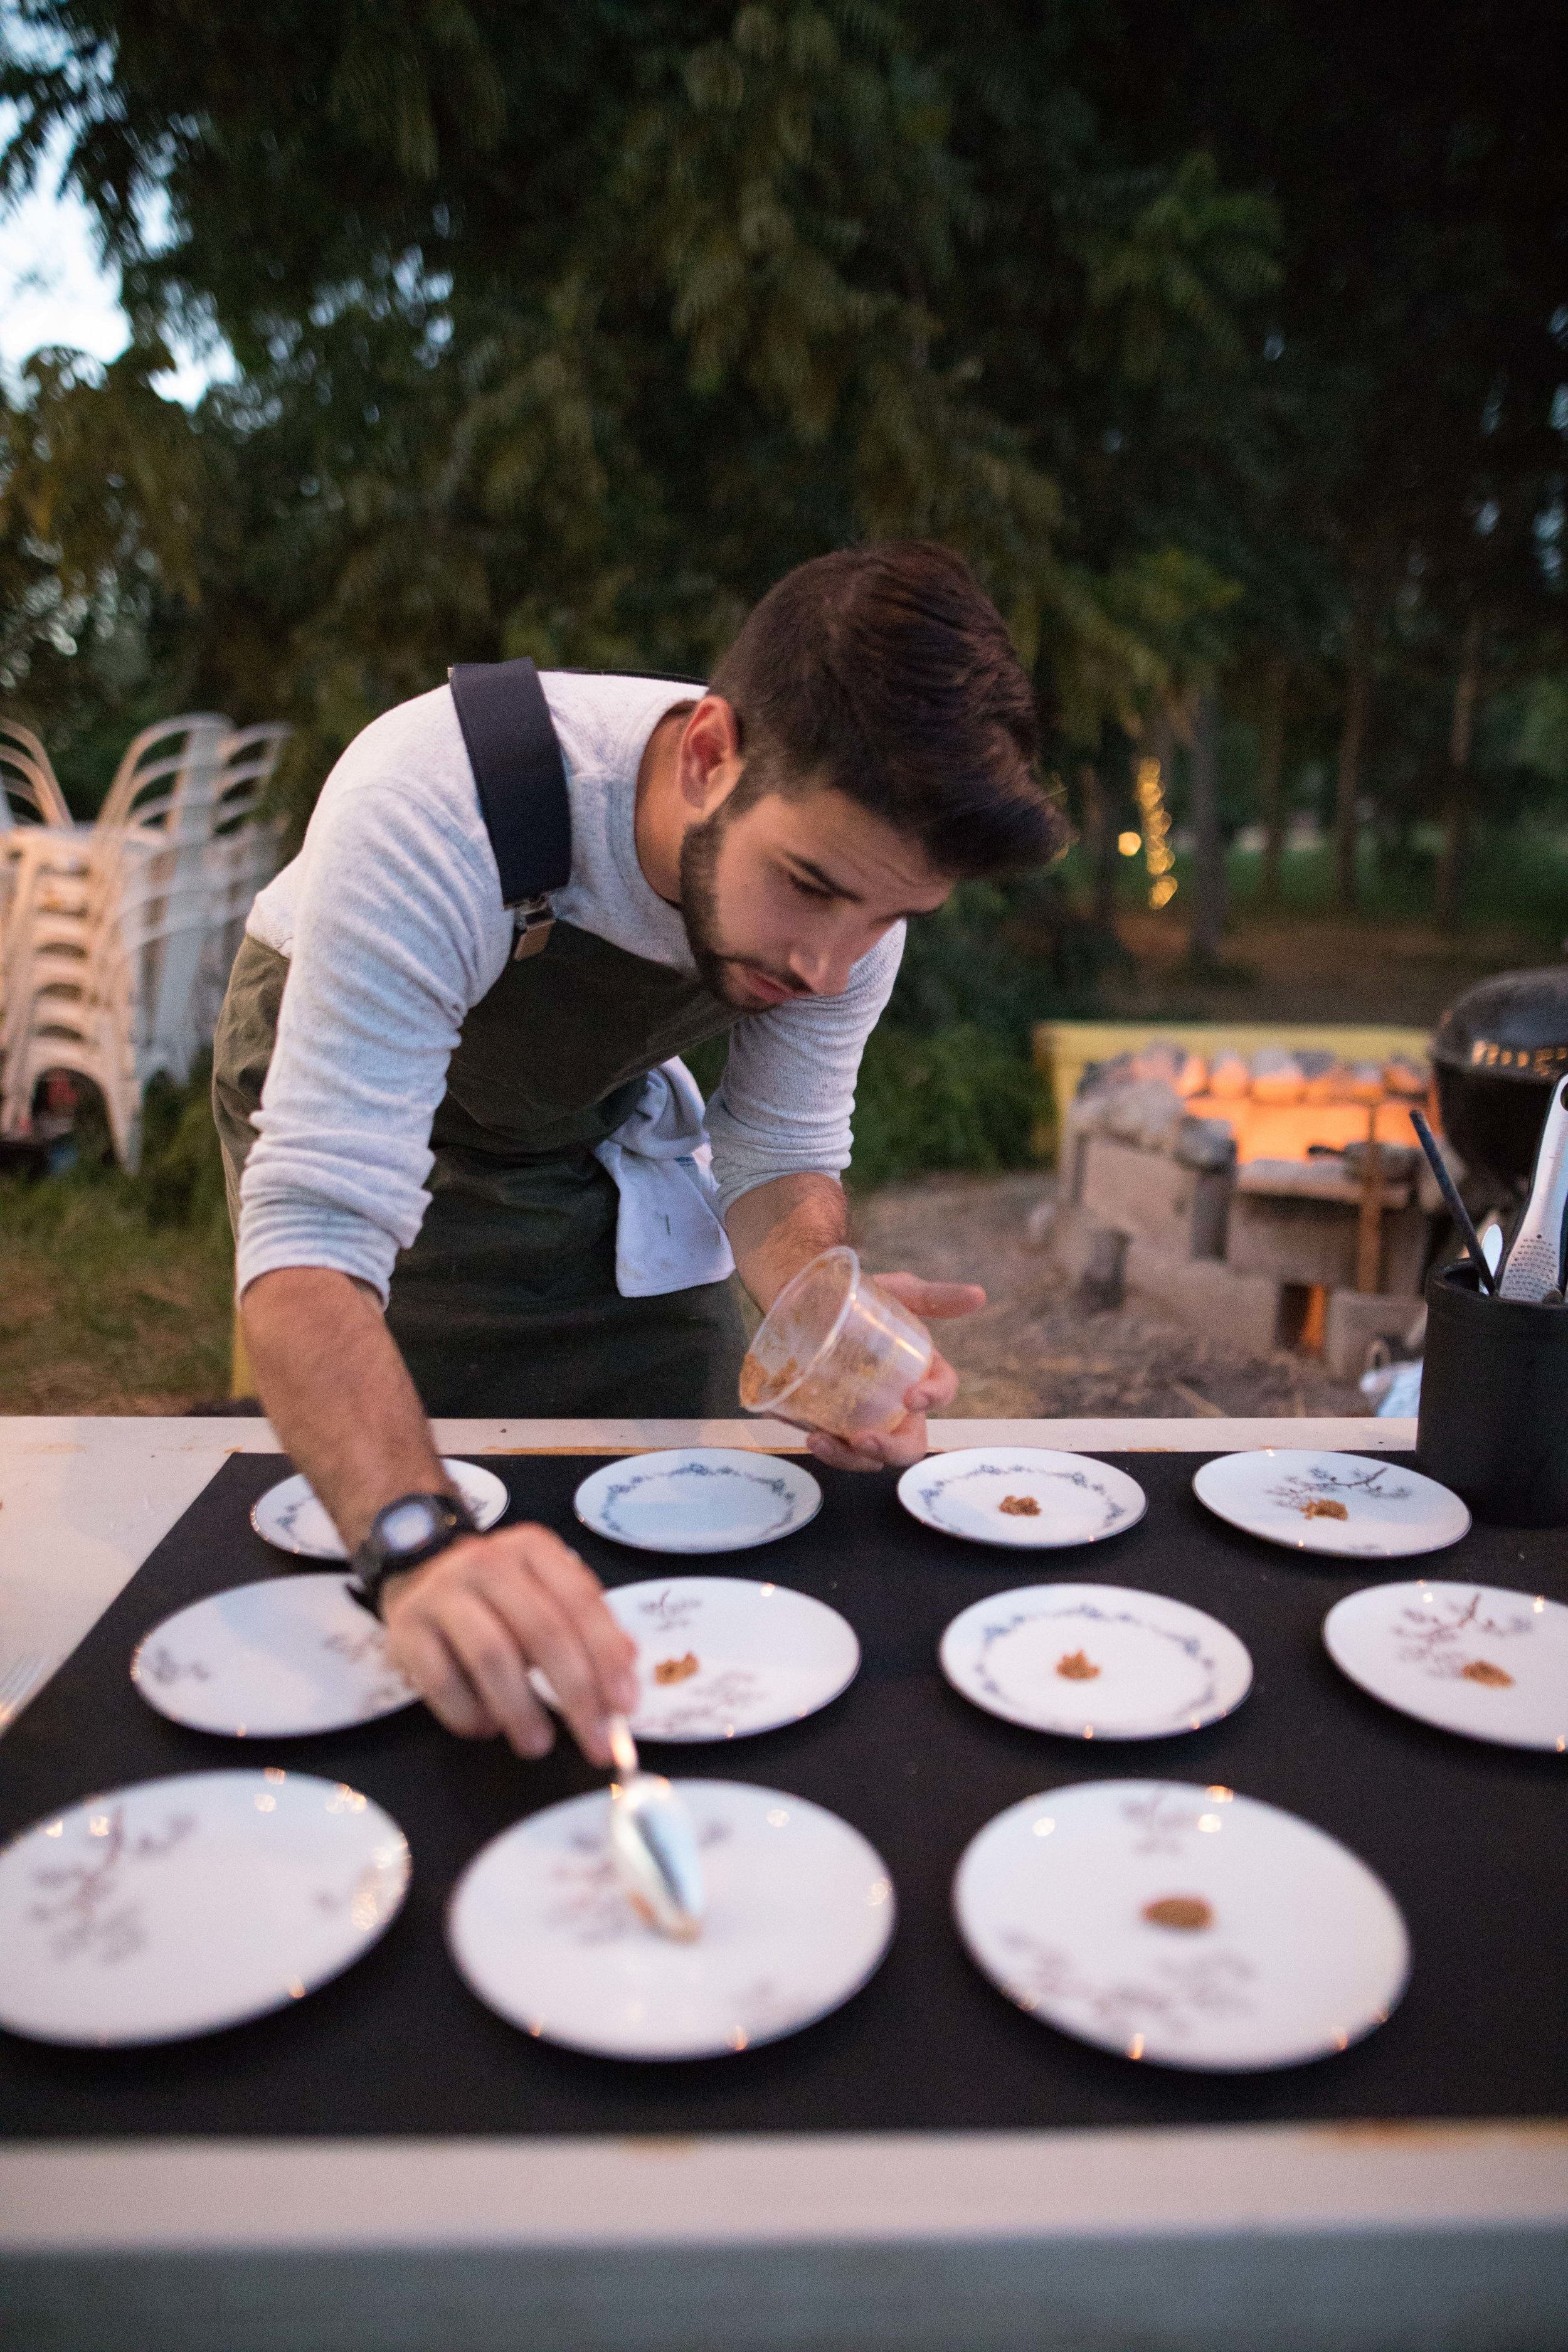 Justin Khanna - Owner/Chef